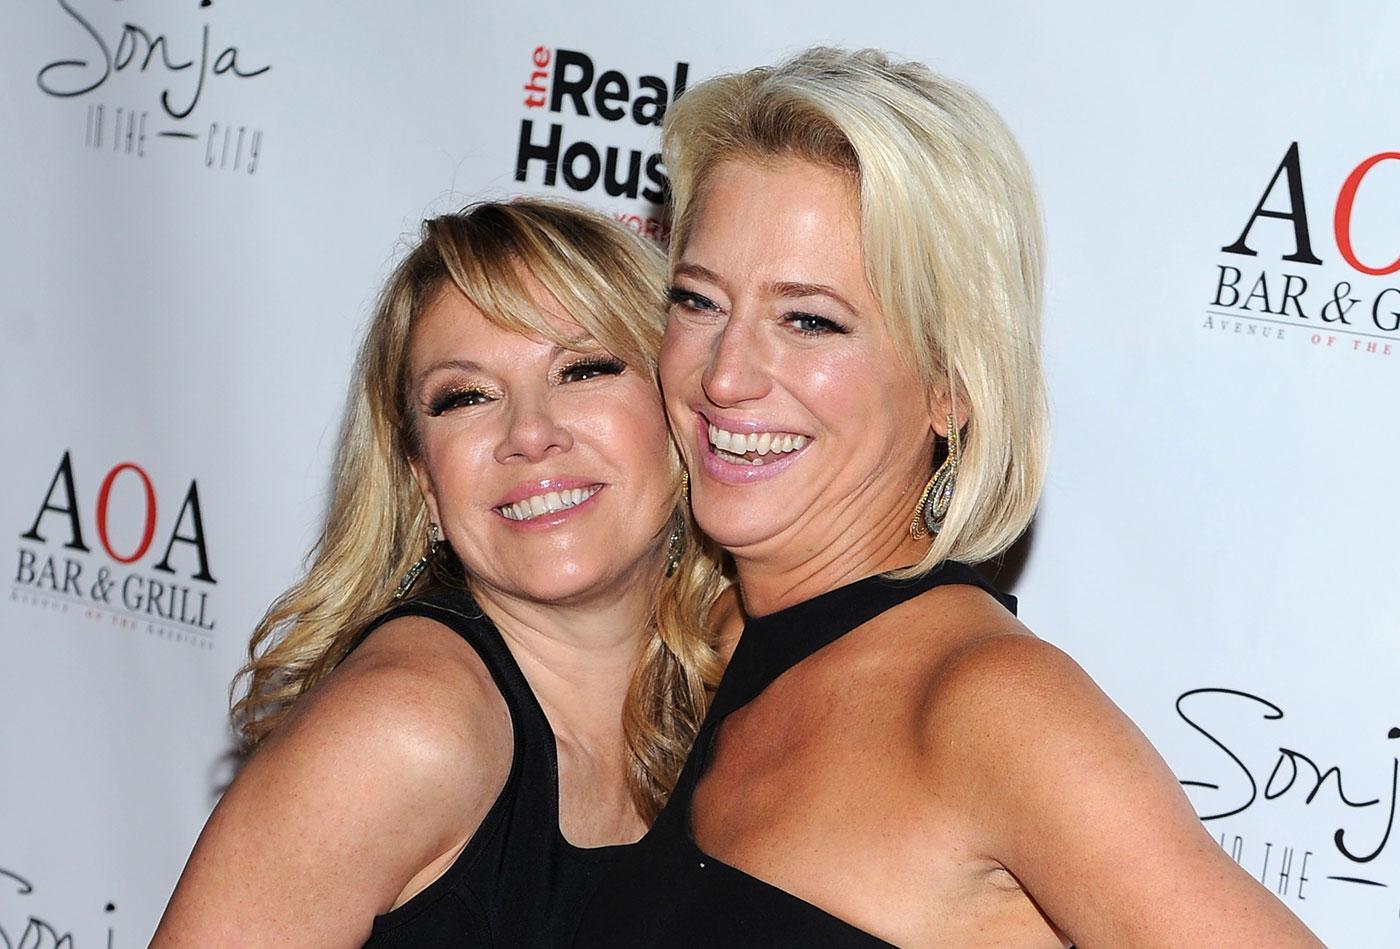 Ramona Singer and Dorinda Medley are feuding on Twitter